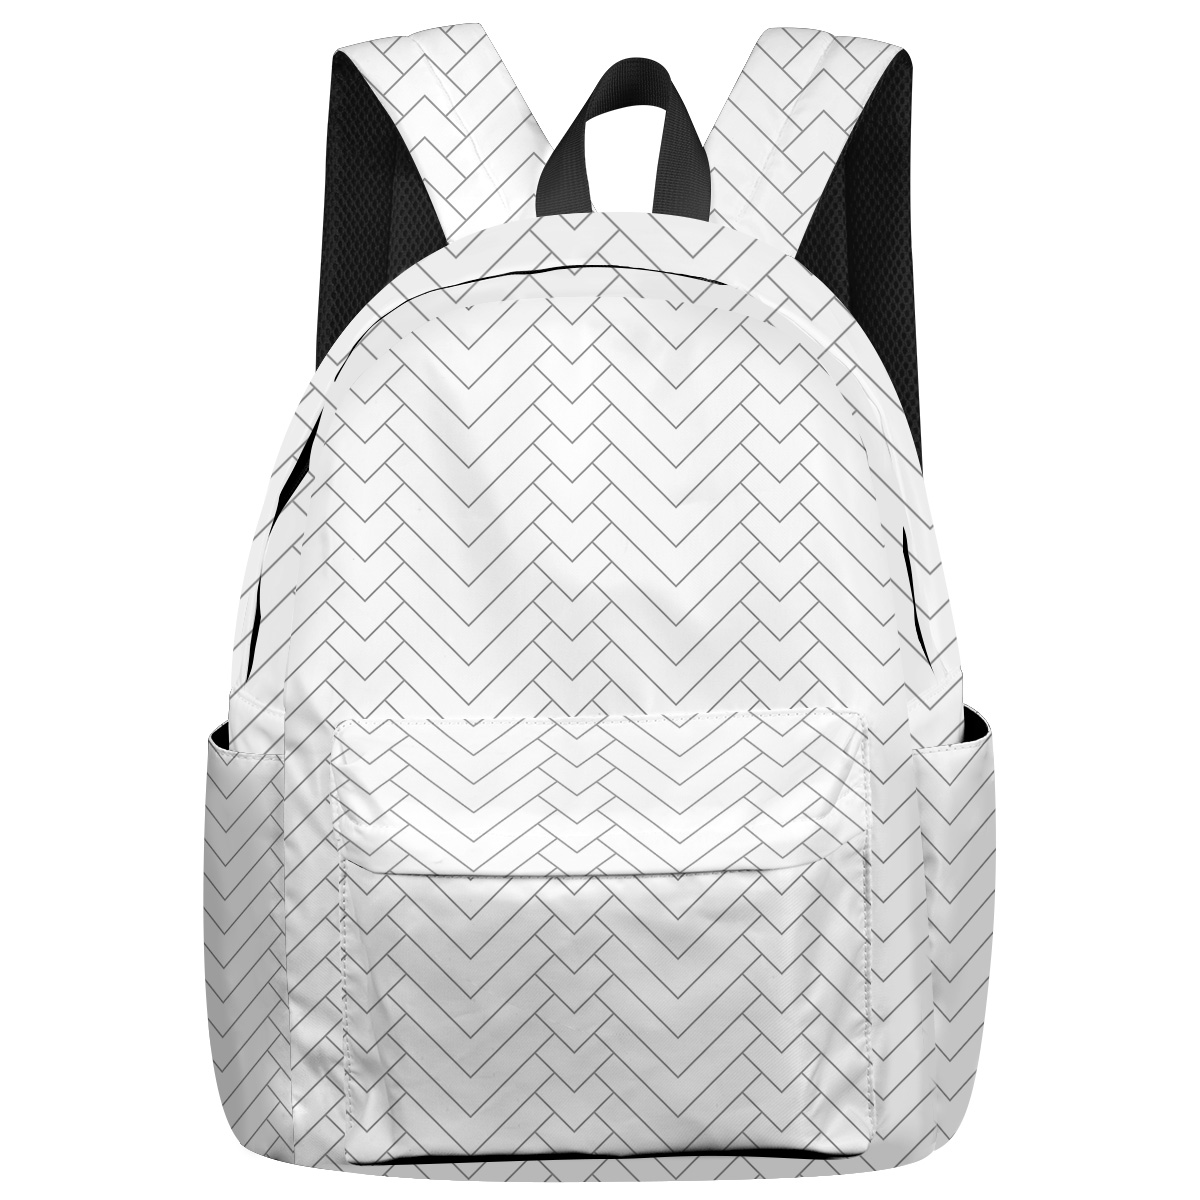 Geometric Pattern Natural Herringbone Bottle Side Pockets Stain Resistant Kids' Backpacks Laptop Backpack Everyday Using